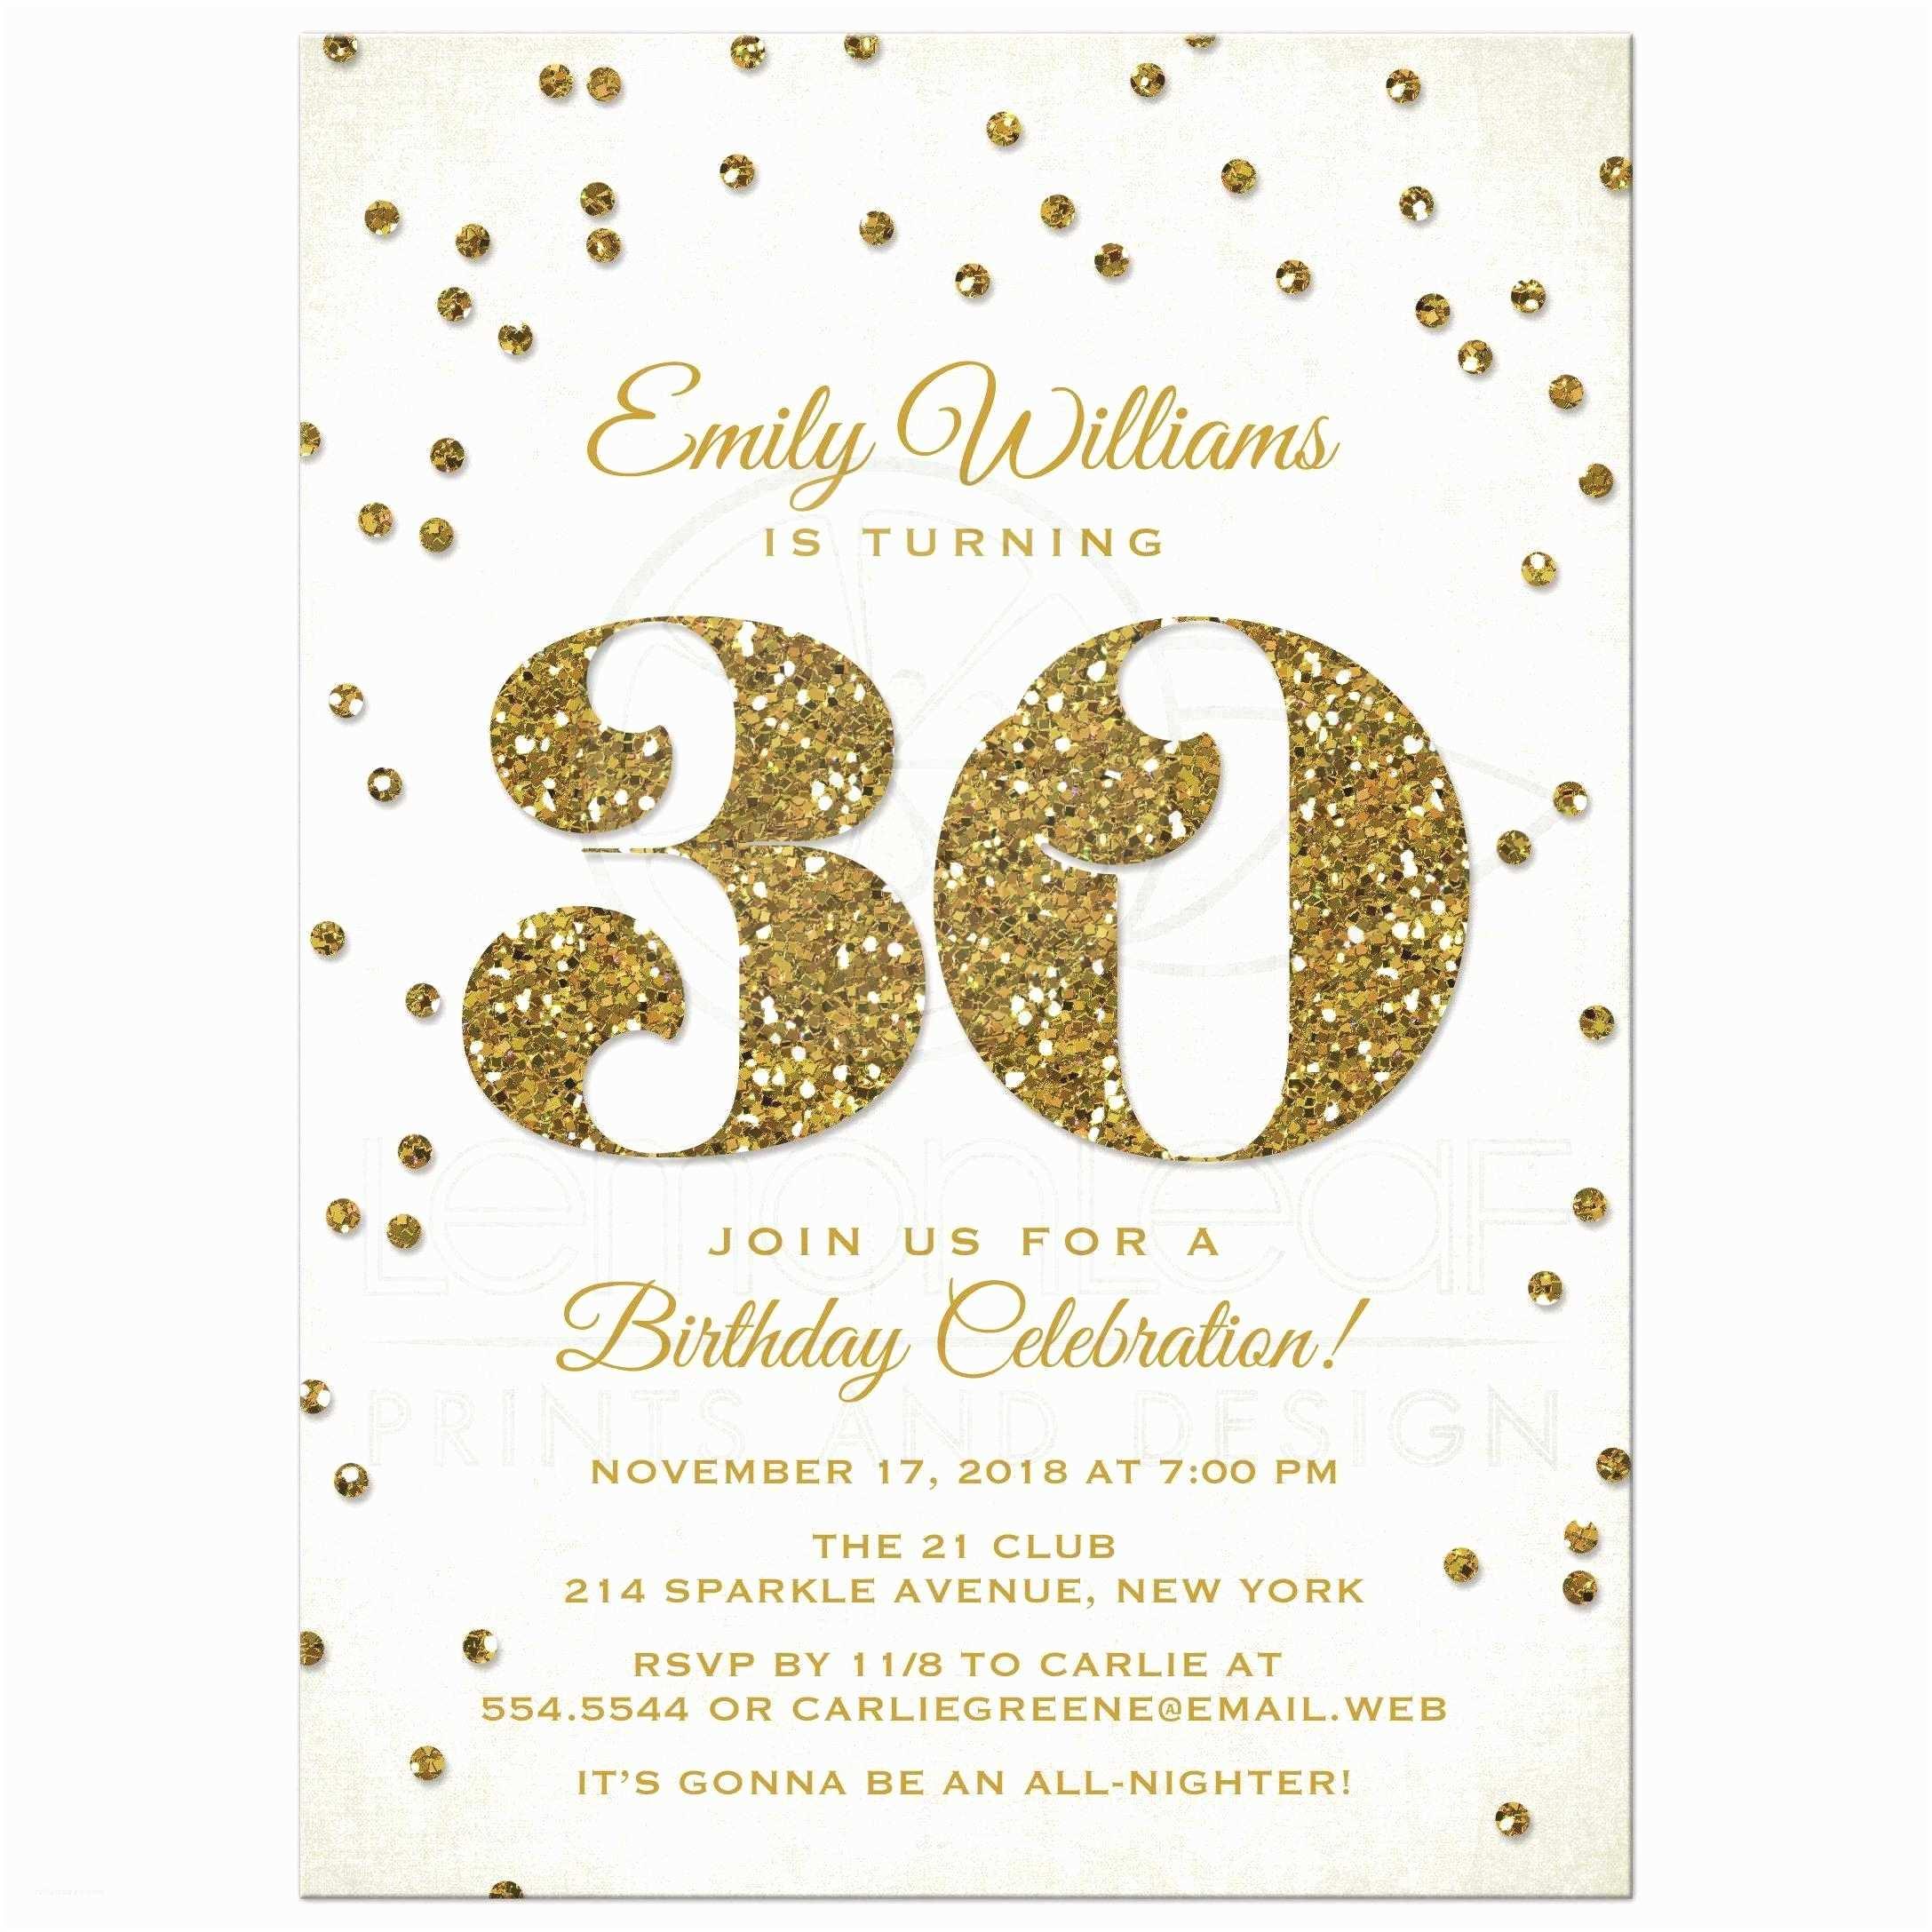 30th Birthday Party Invitations 30th Birthday Party Invitations Gold Glitter Look Confetti